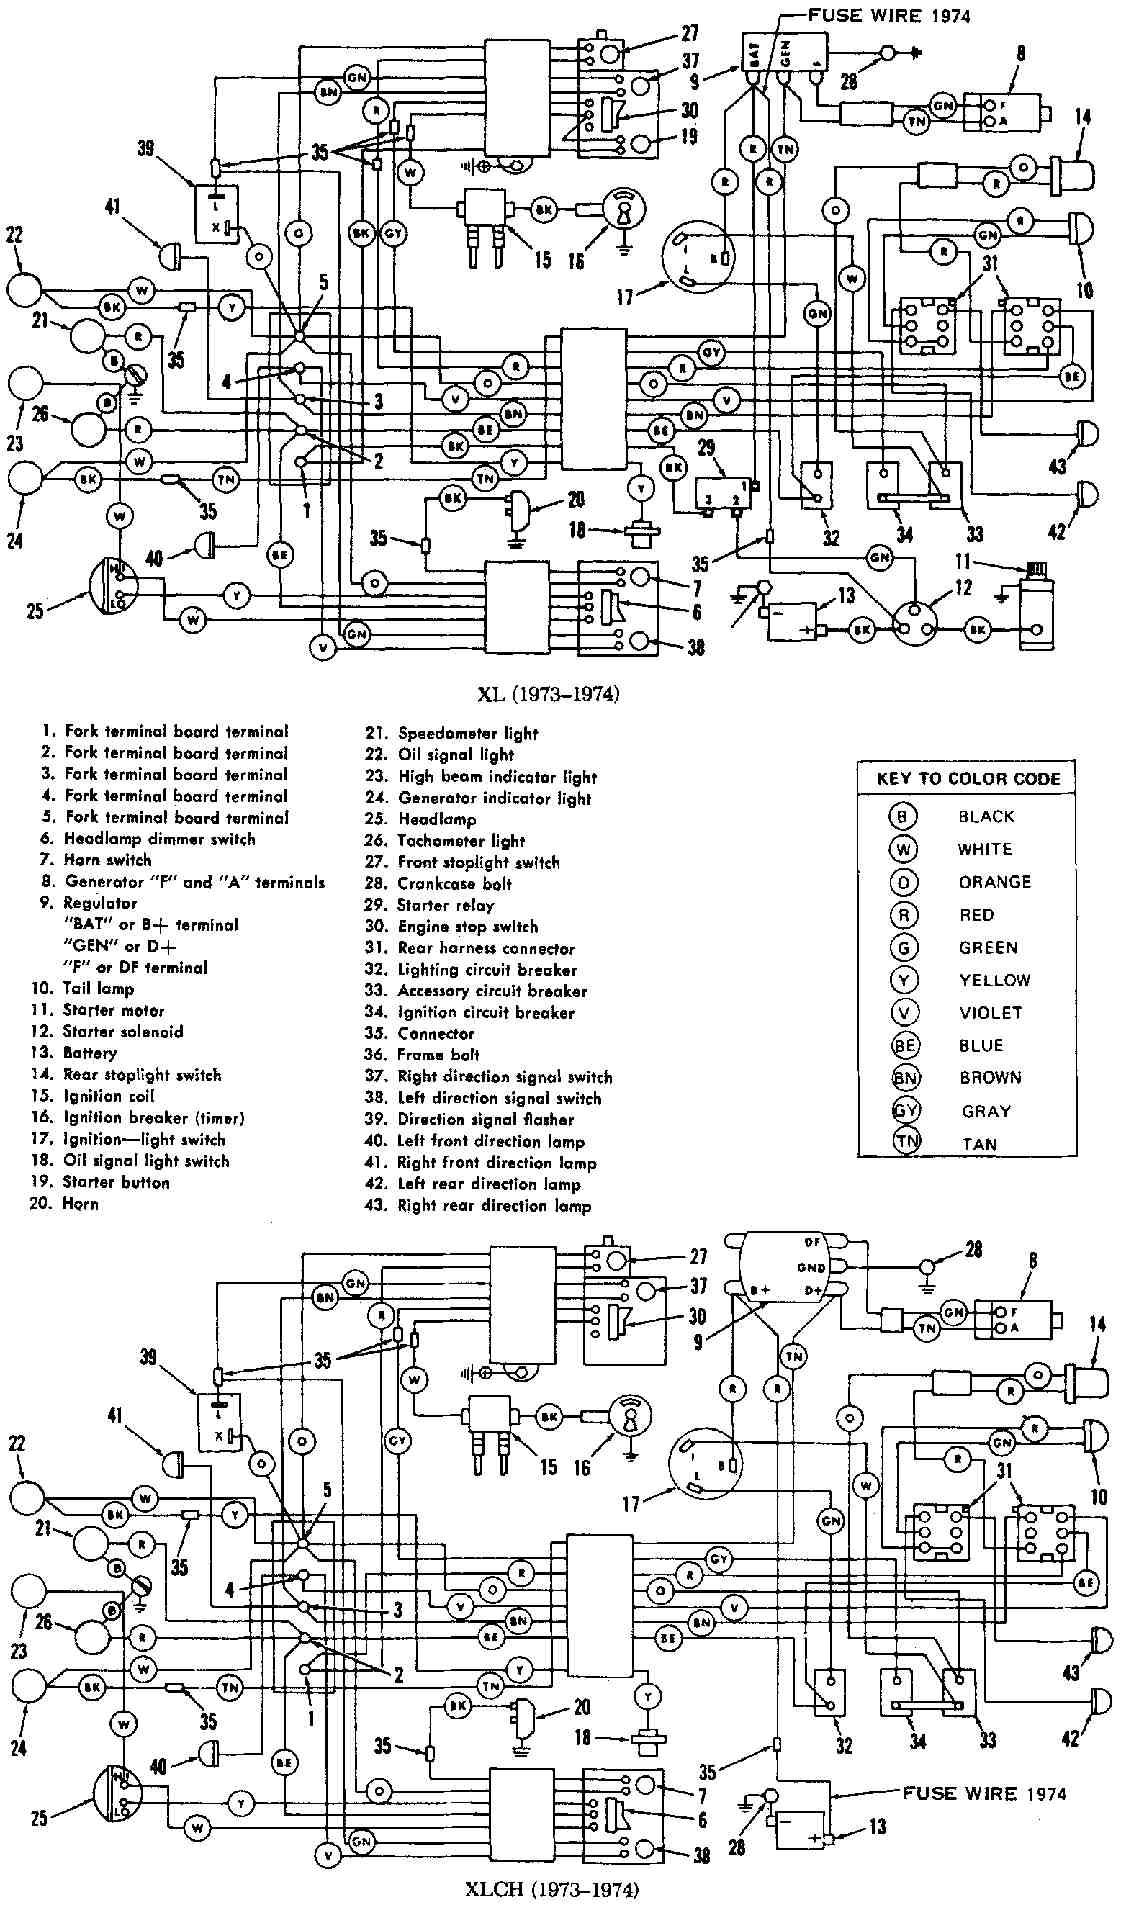 medium resolution of harley flh wiring harness diagram wiring diagram harley shovelhead oil cooler harley flh wire harness schematic